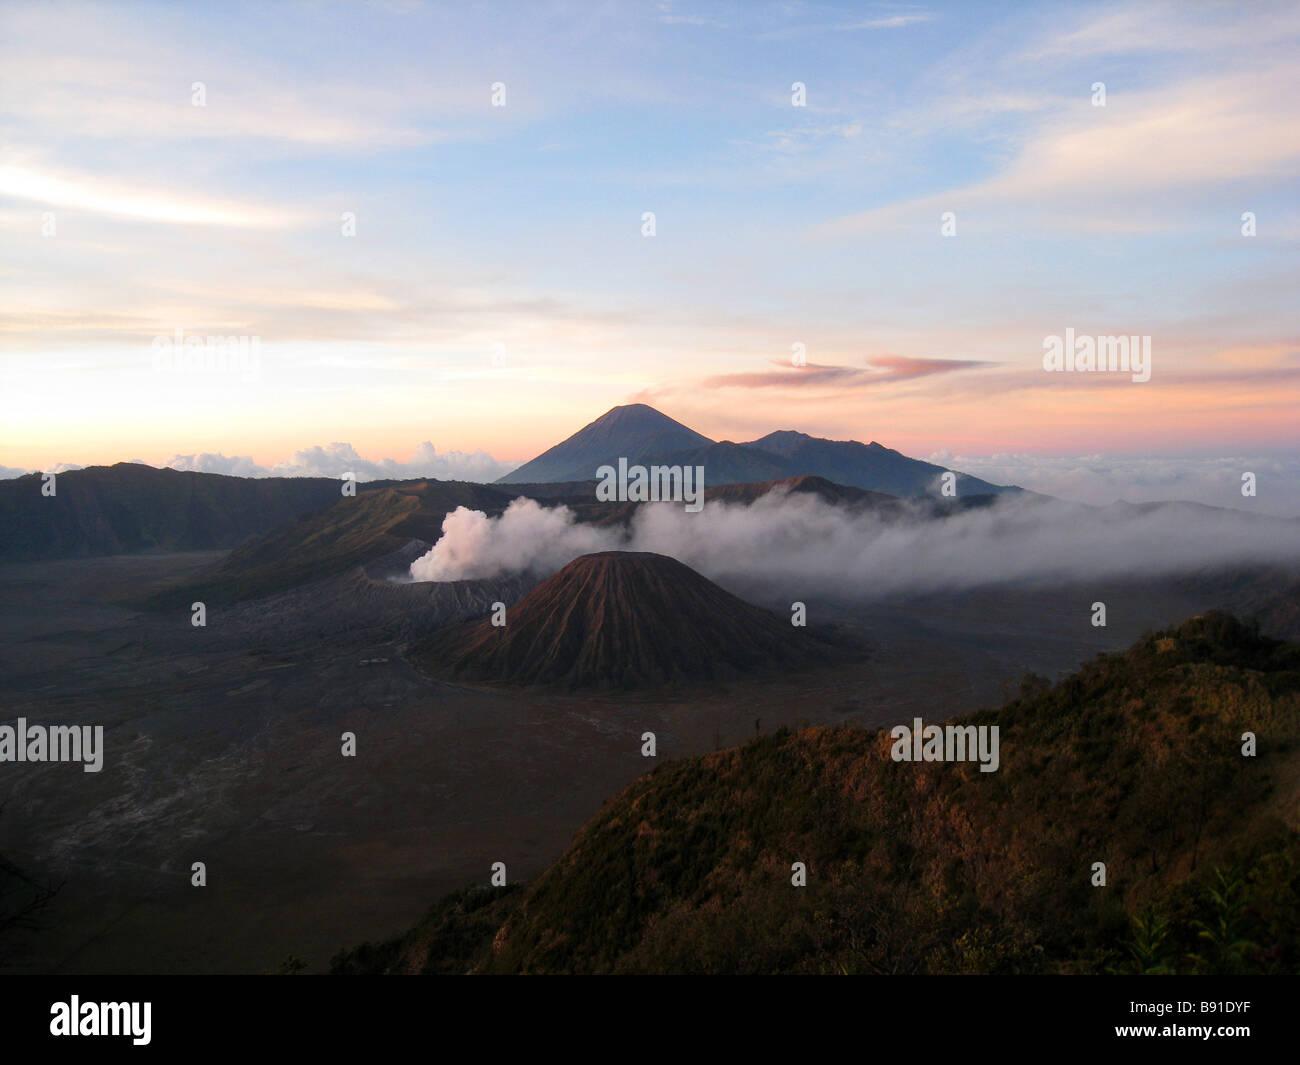 Sunrise over Mt Bromo, Java, Indonesia - Stock Image